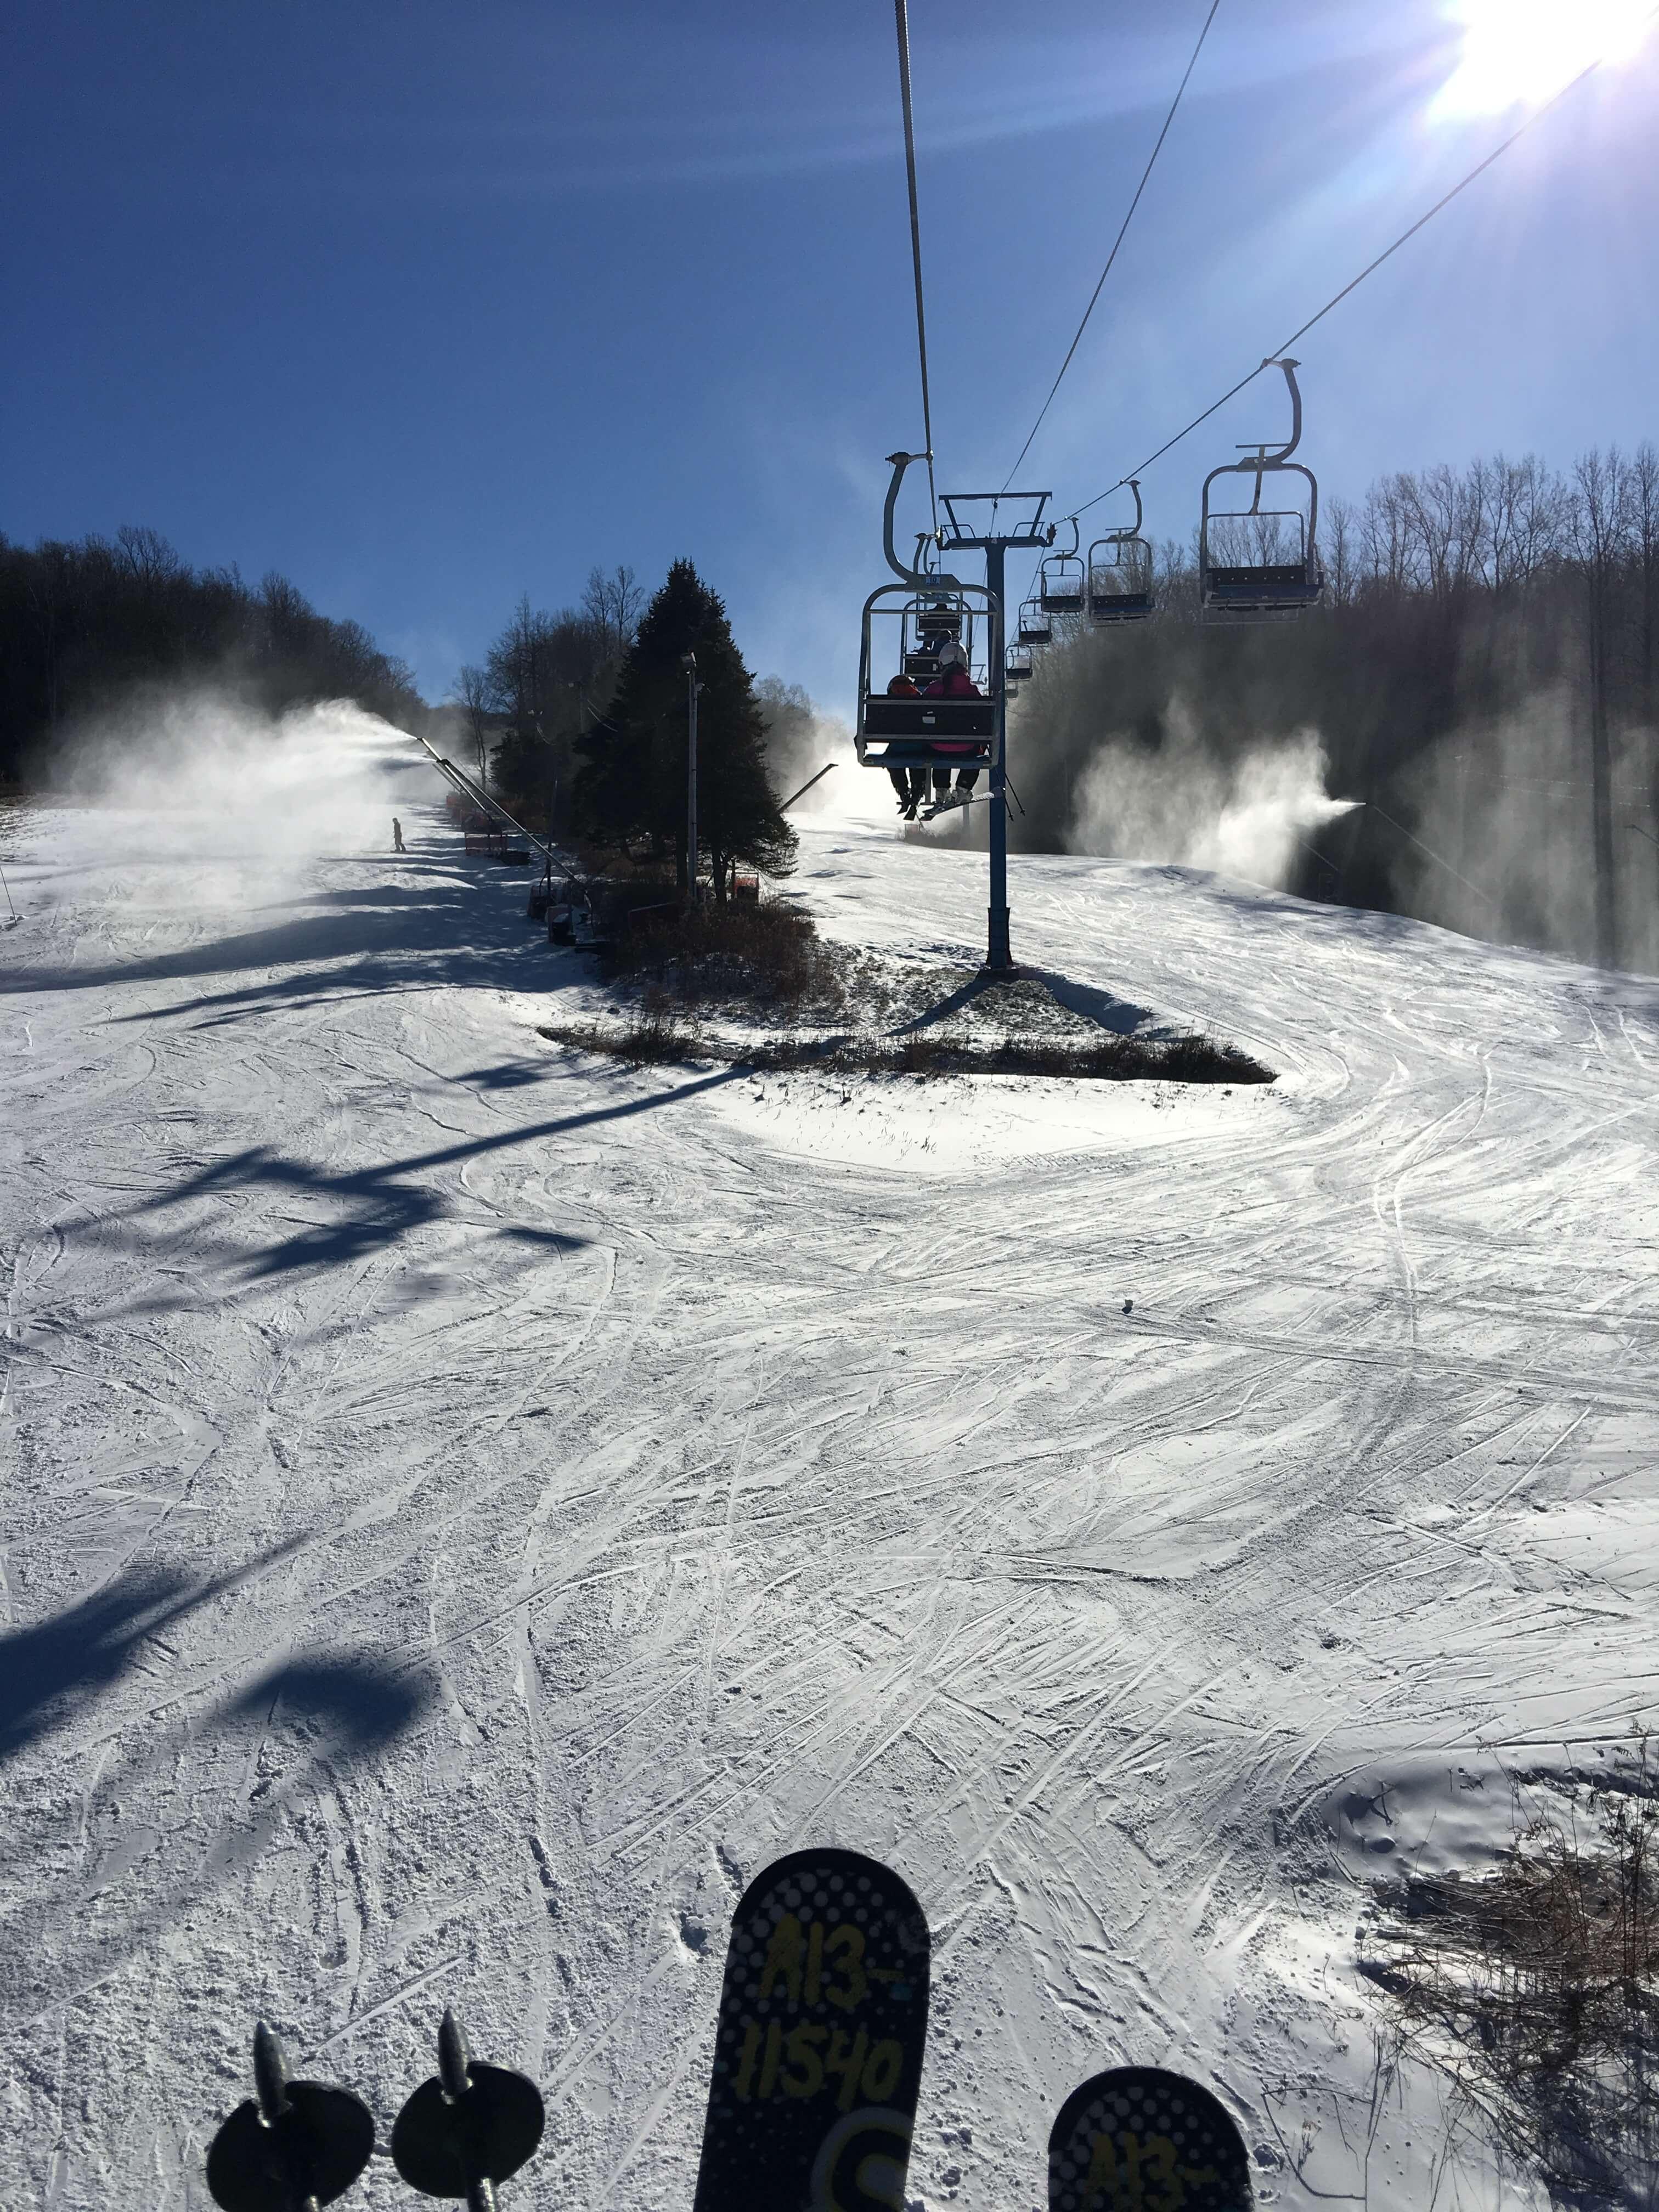 First-Time Skiing at Shawnee Mountain Ski Area